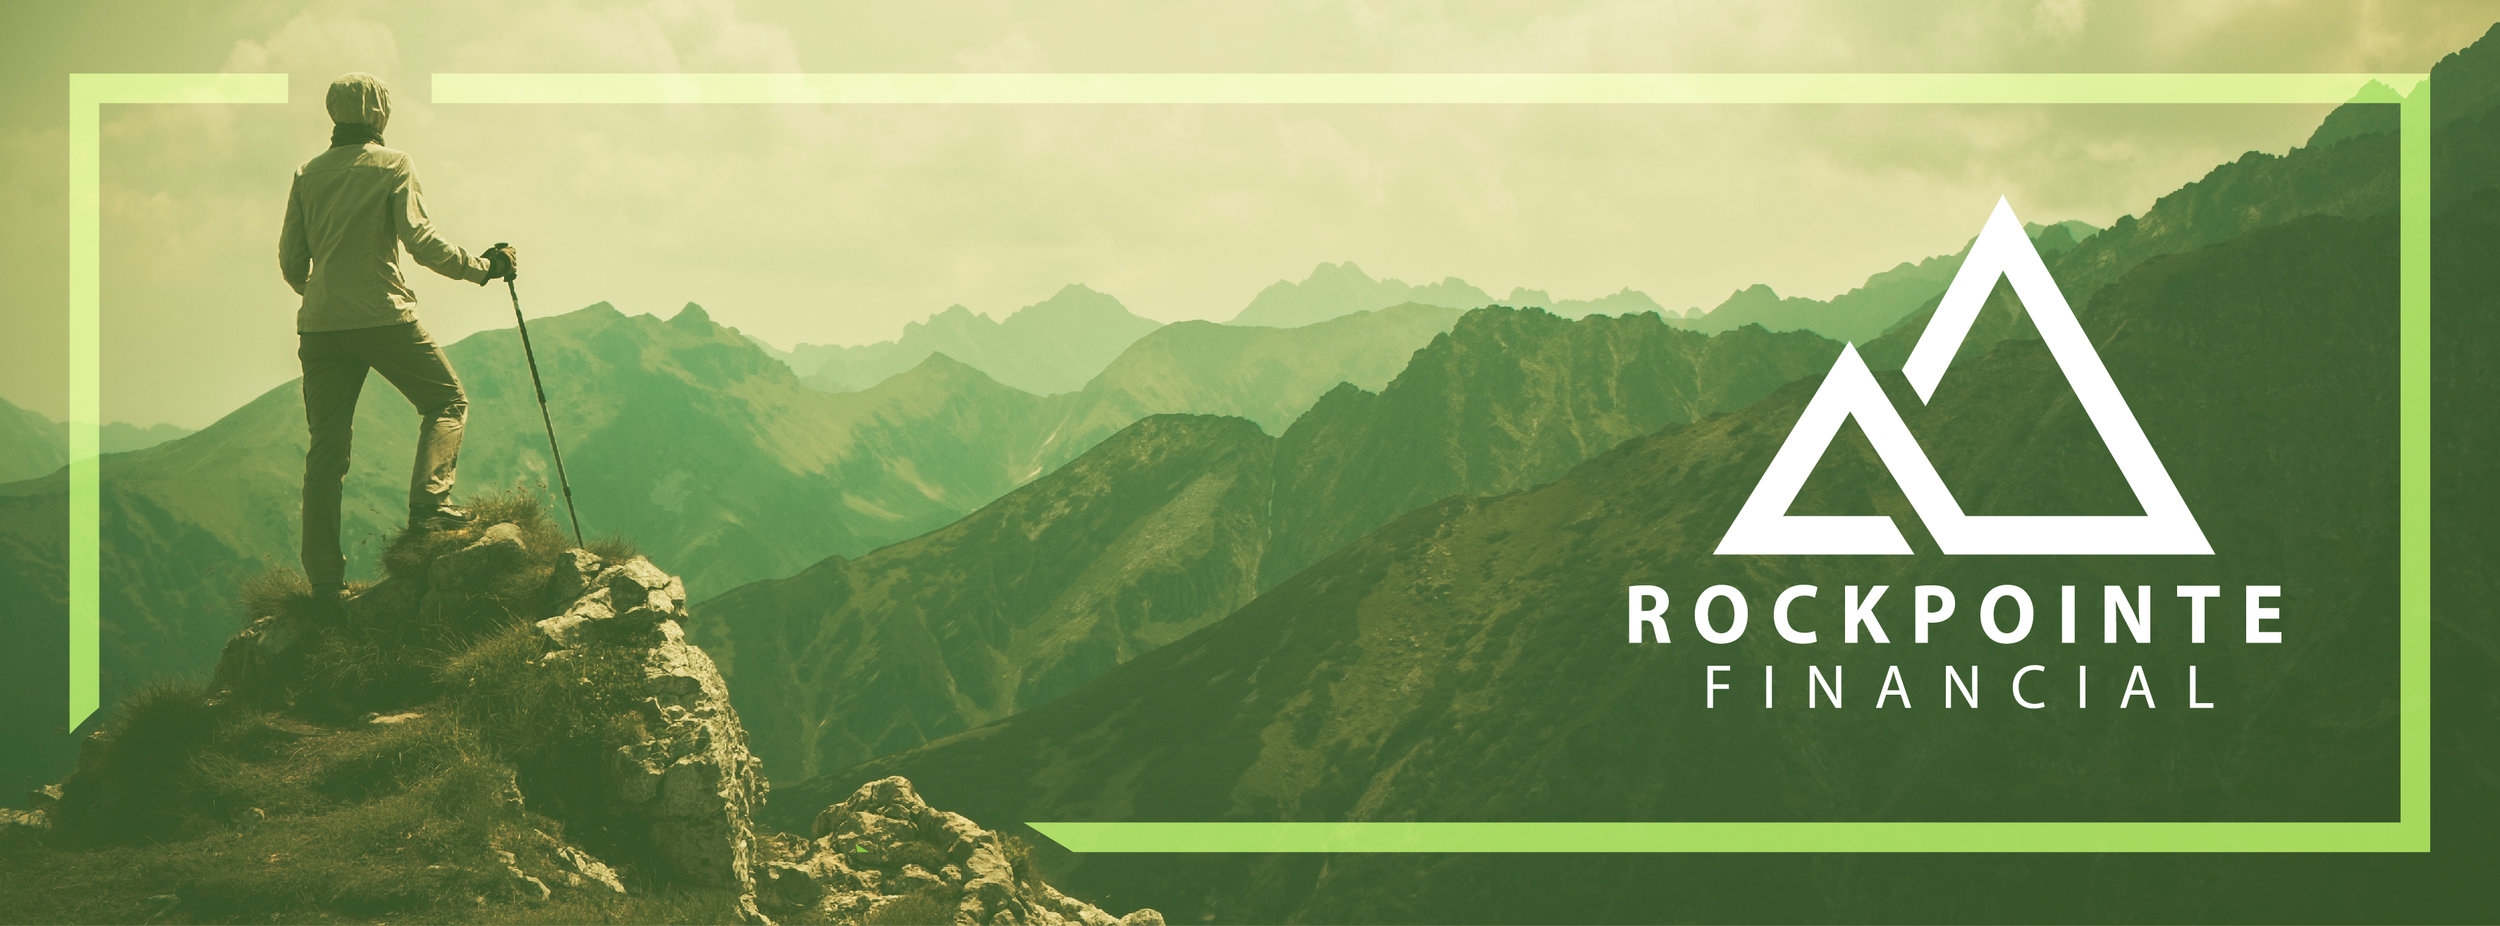 RockpointeFinancial-Branding-FF_Social COver.jpg